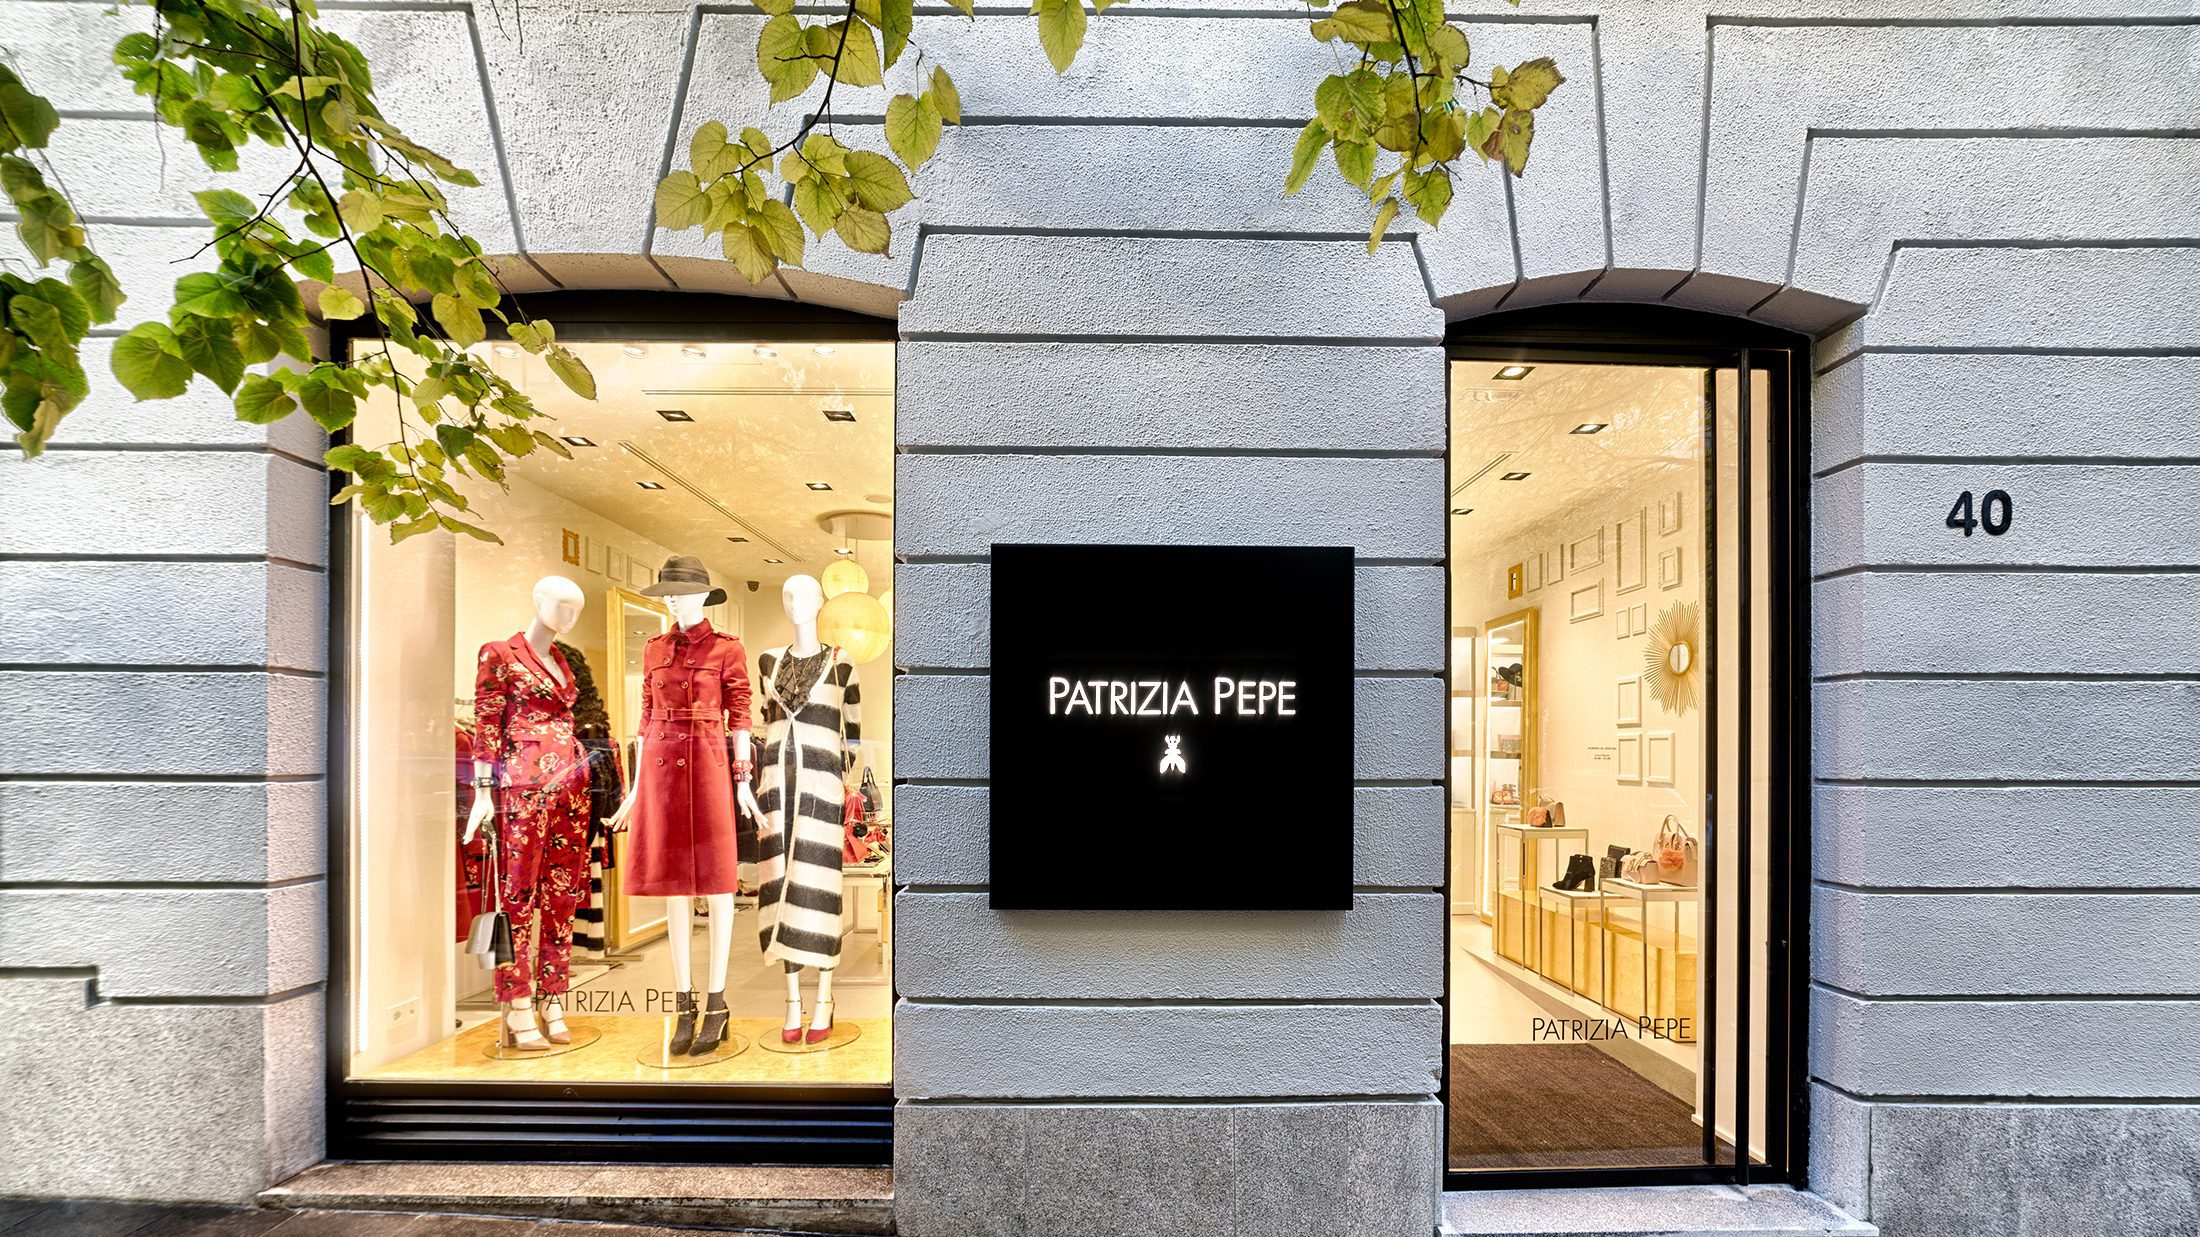 Boutique Patrizia Pepe, barrio de Salamanca, Madrid